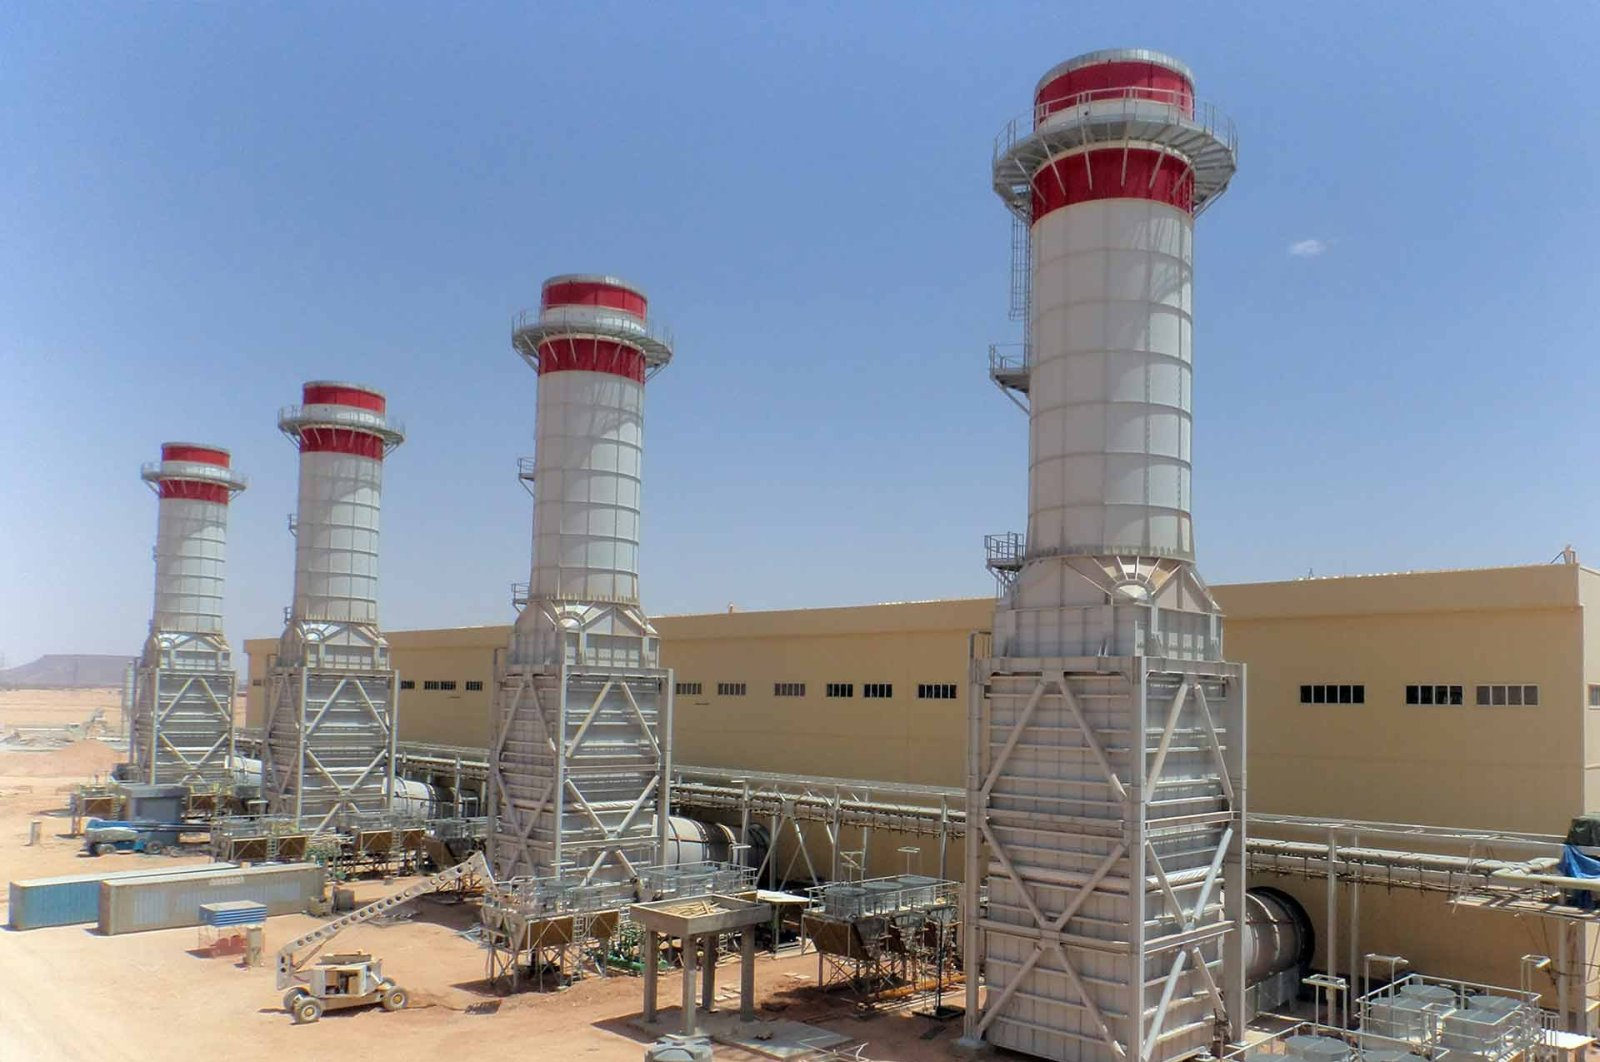 The Ubari natural gas power plant is seen in this undated file photo, Ubari, Libya.